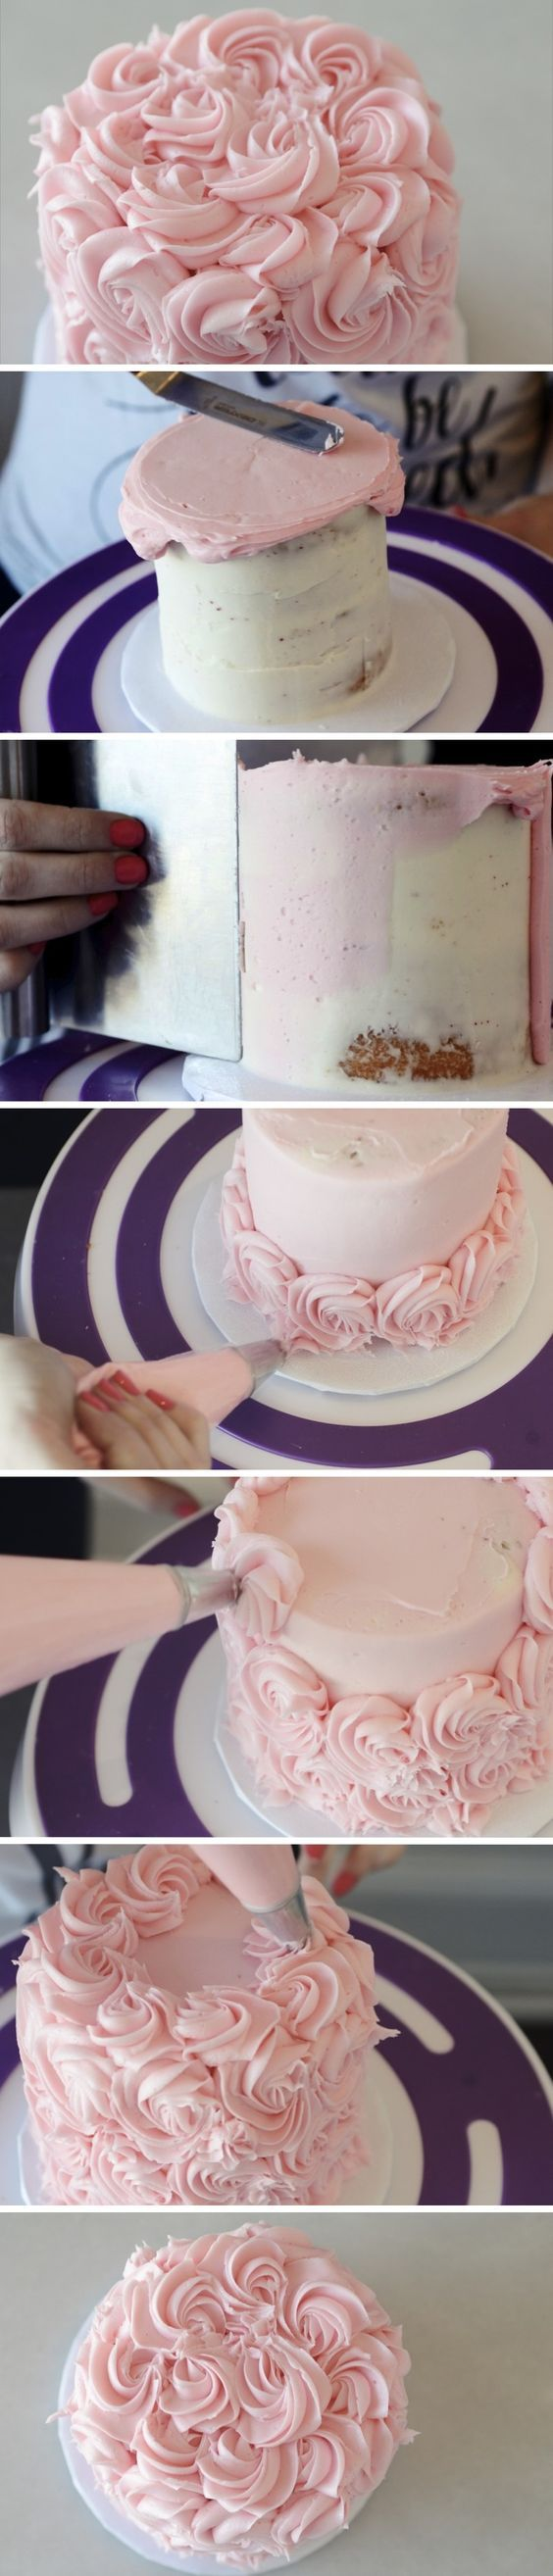 How to Frost a Rose Cake | Relish.com More (mirror glaze cake mermaid)